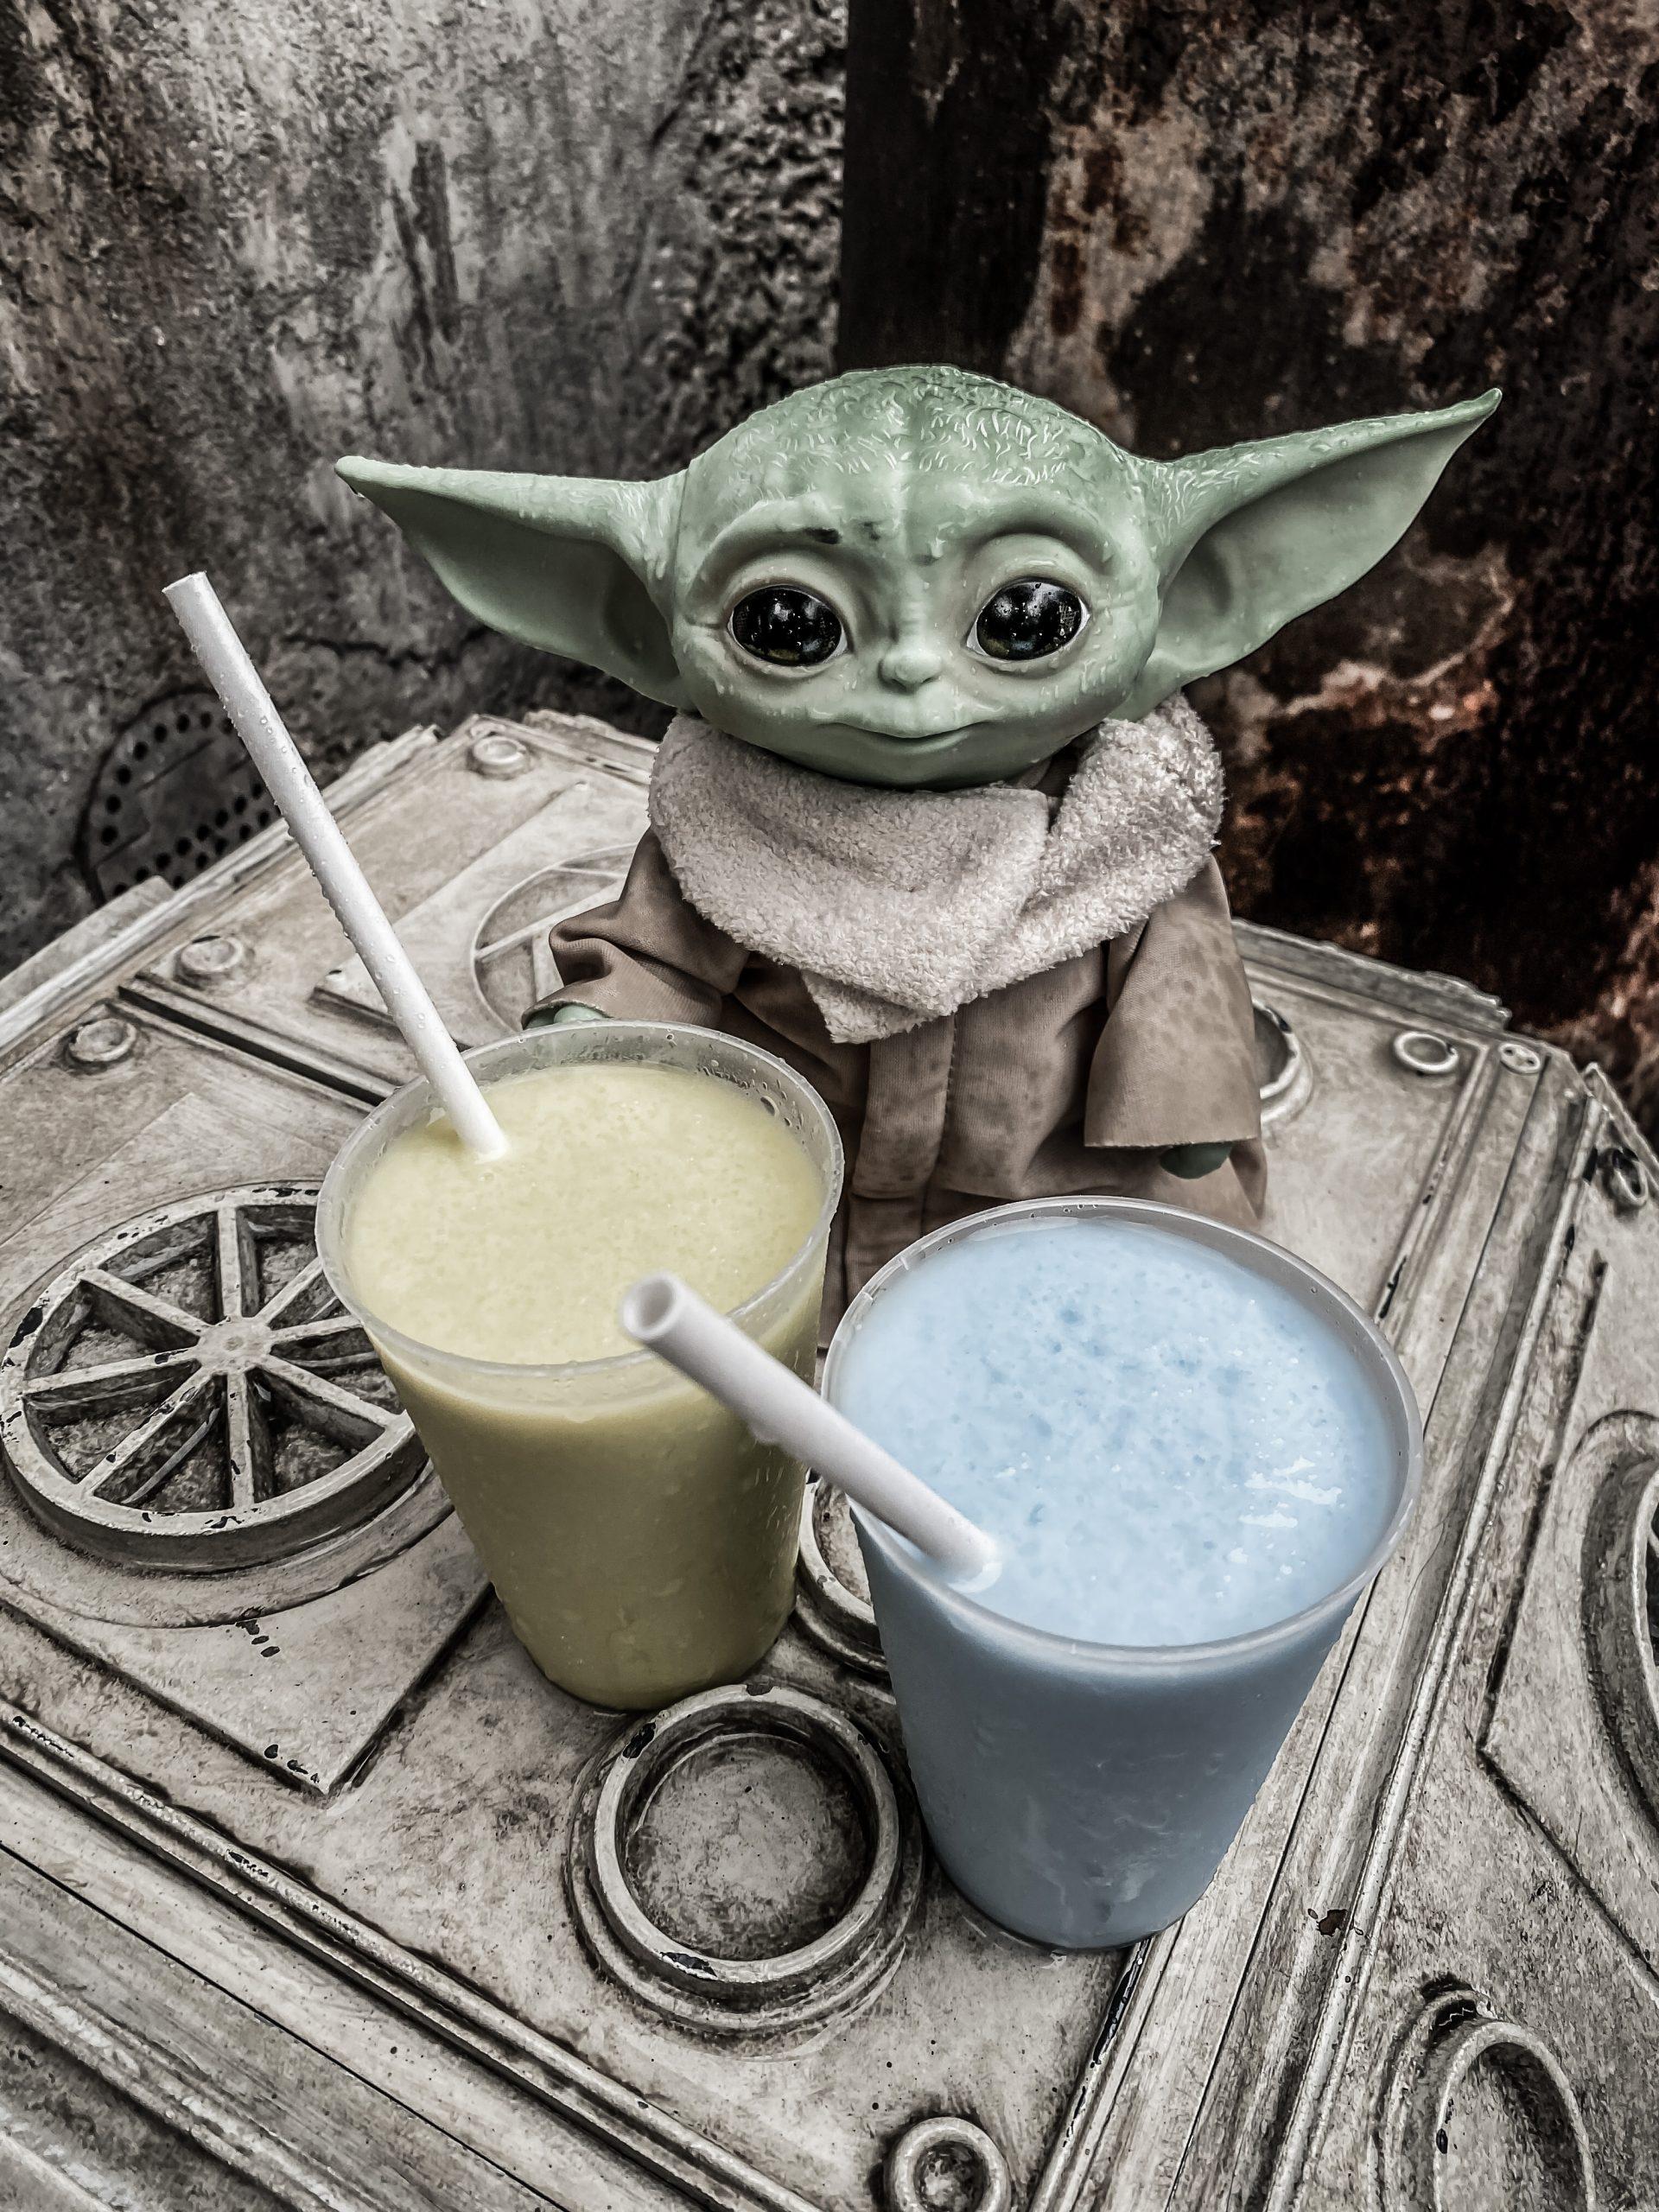 My Experience At Disney's Hollywood Studios/ Star Wars: Galaxy's Edge